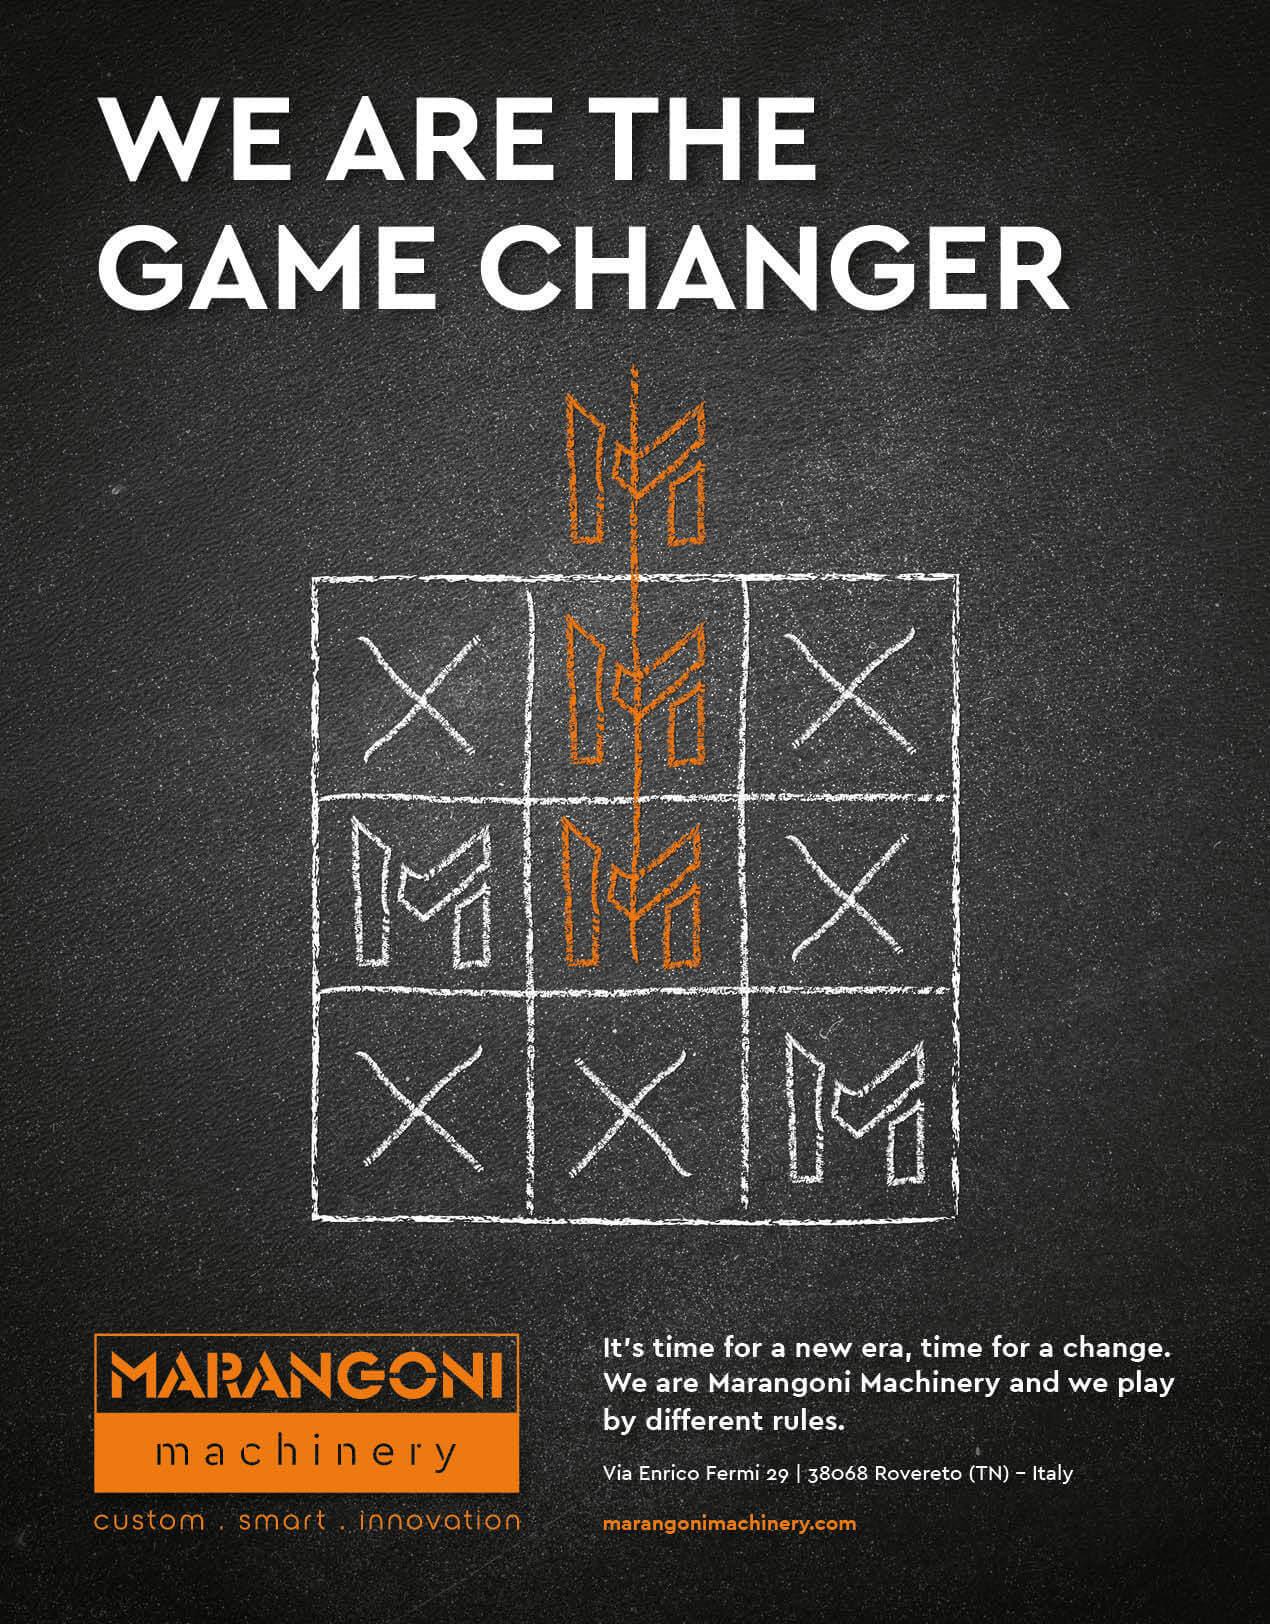 Marangoni Machinery is a game changer